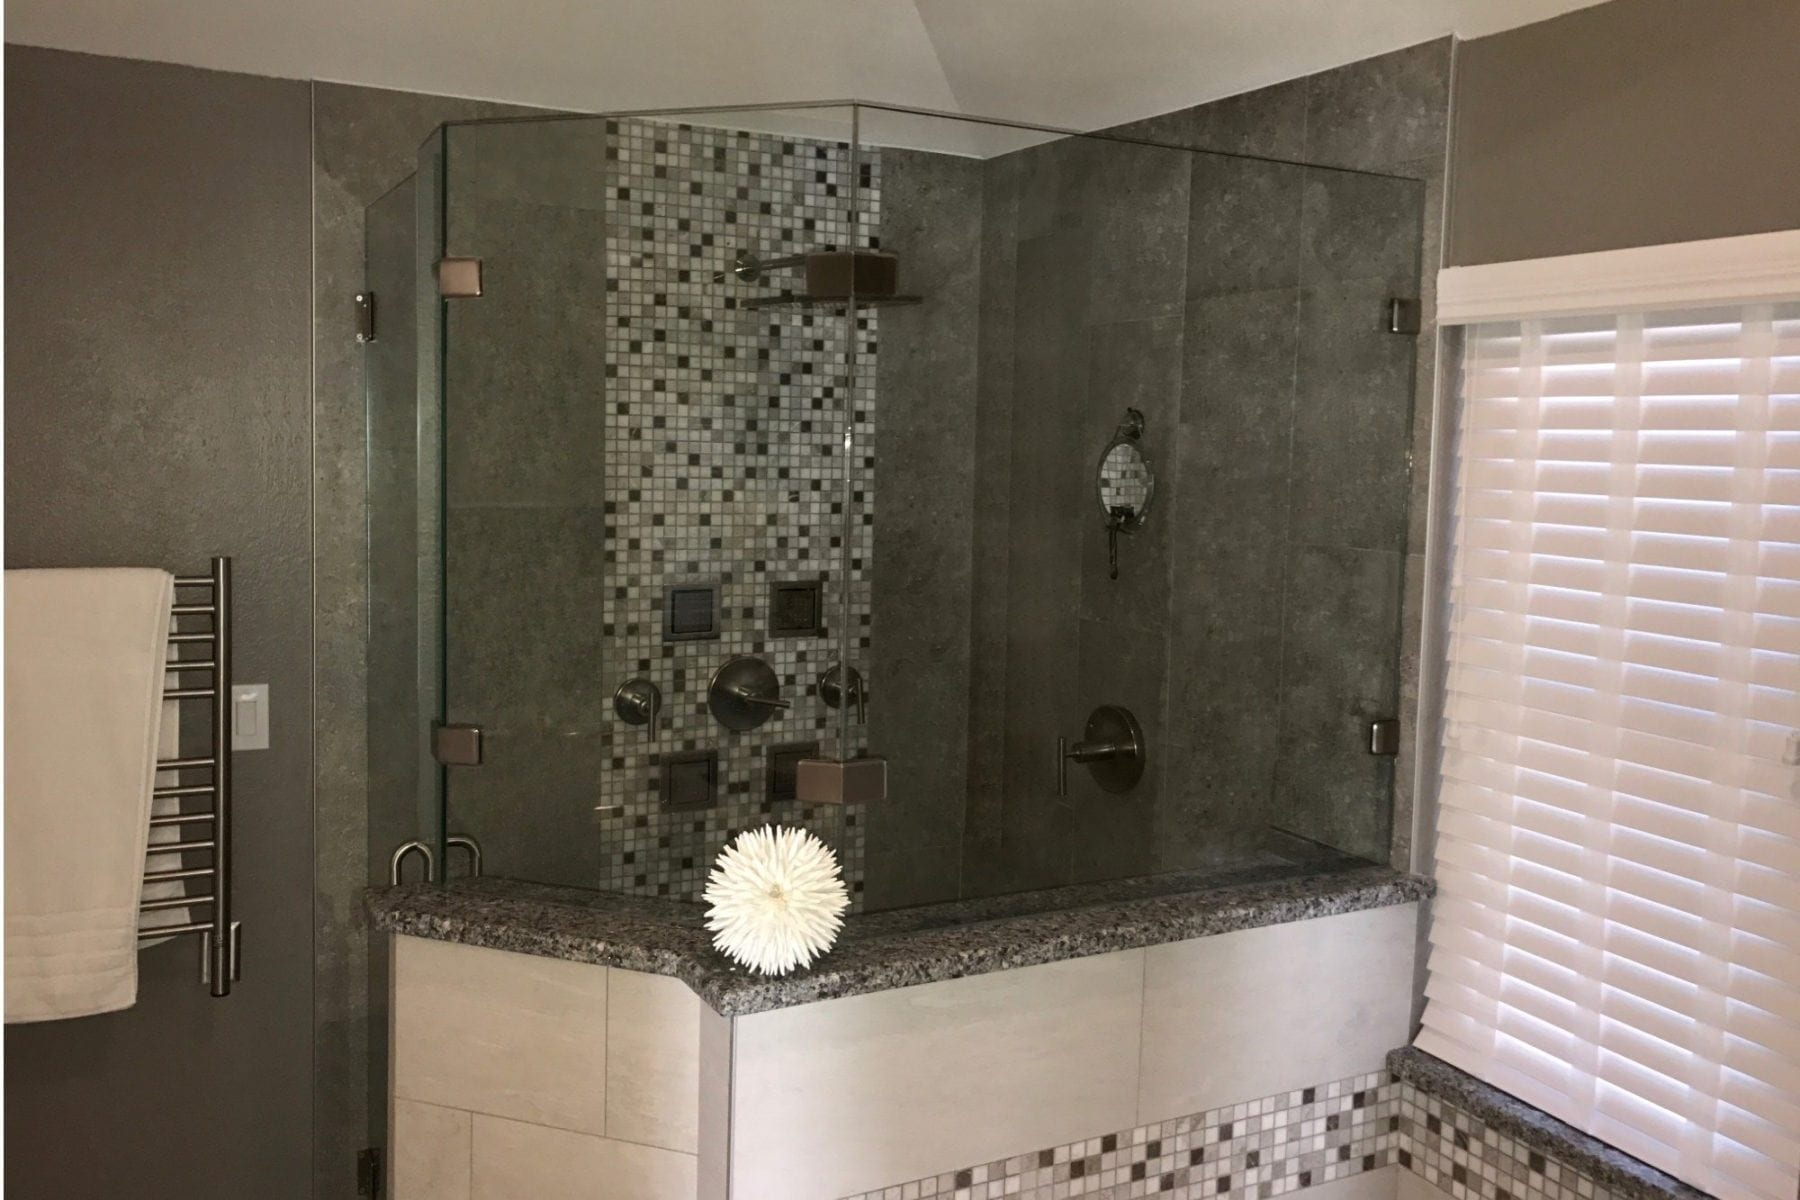 Oak Lawn Condo Bathroom Remodel After Renovation Shower